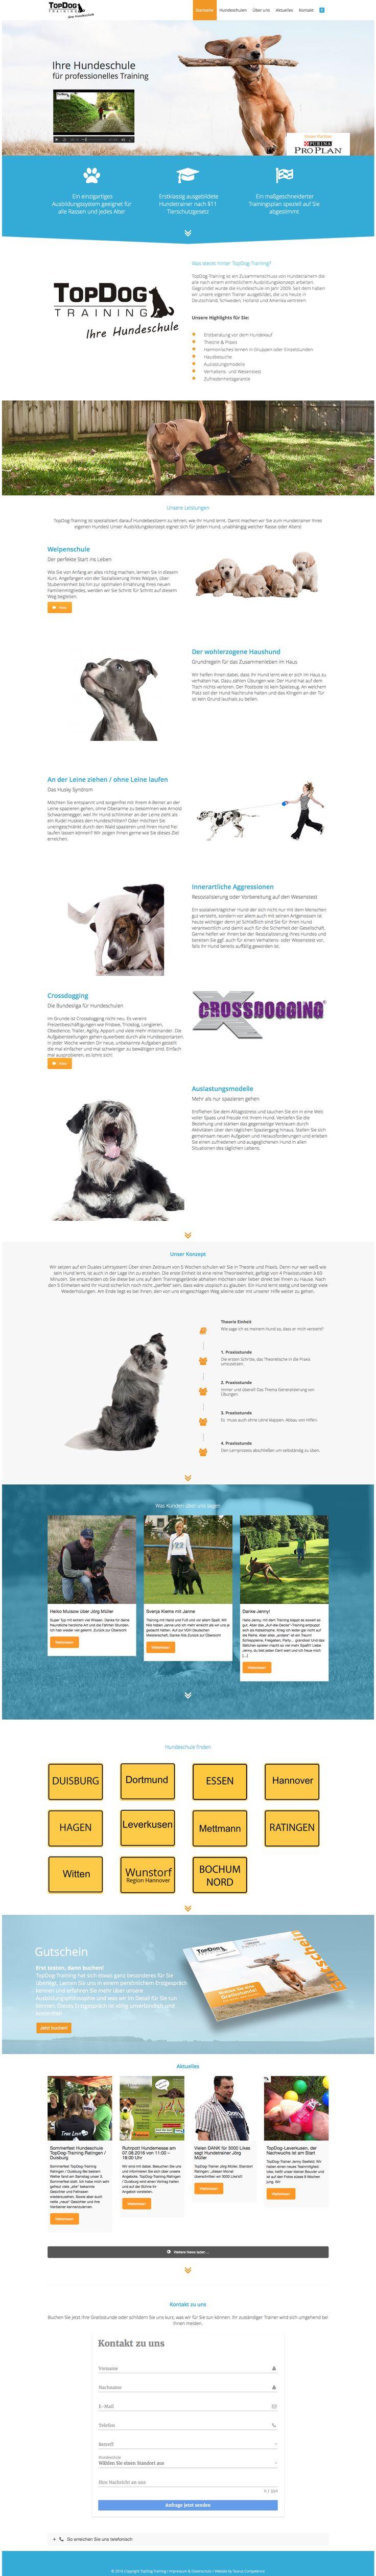 Webdesign - Hundeschule TopDog Training